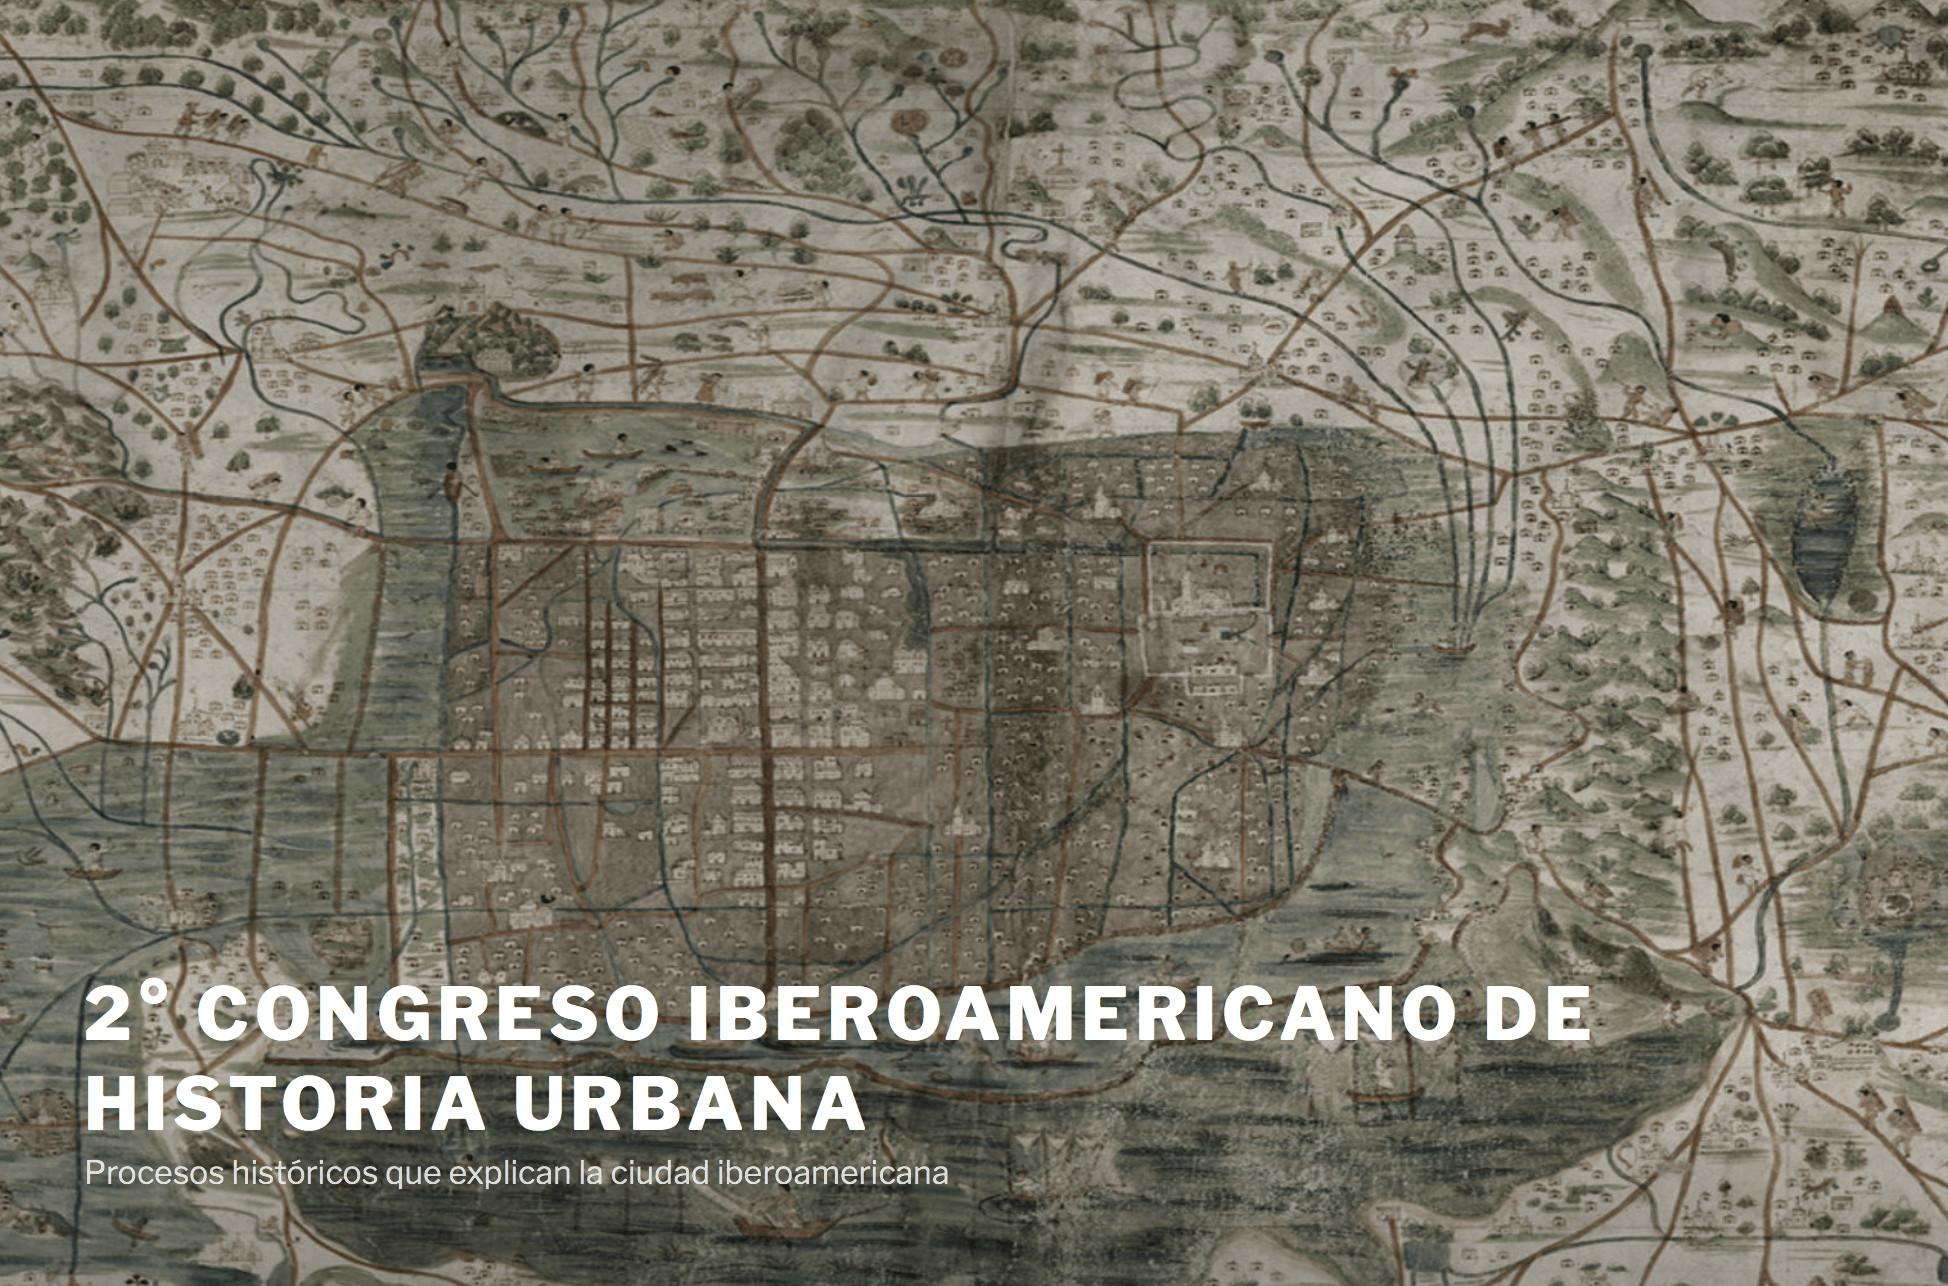 congreso iberoamericano de historia urbana